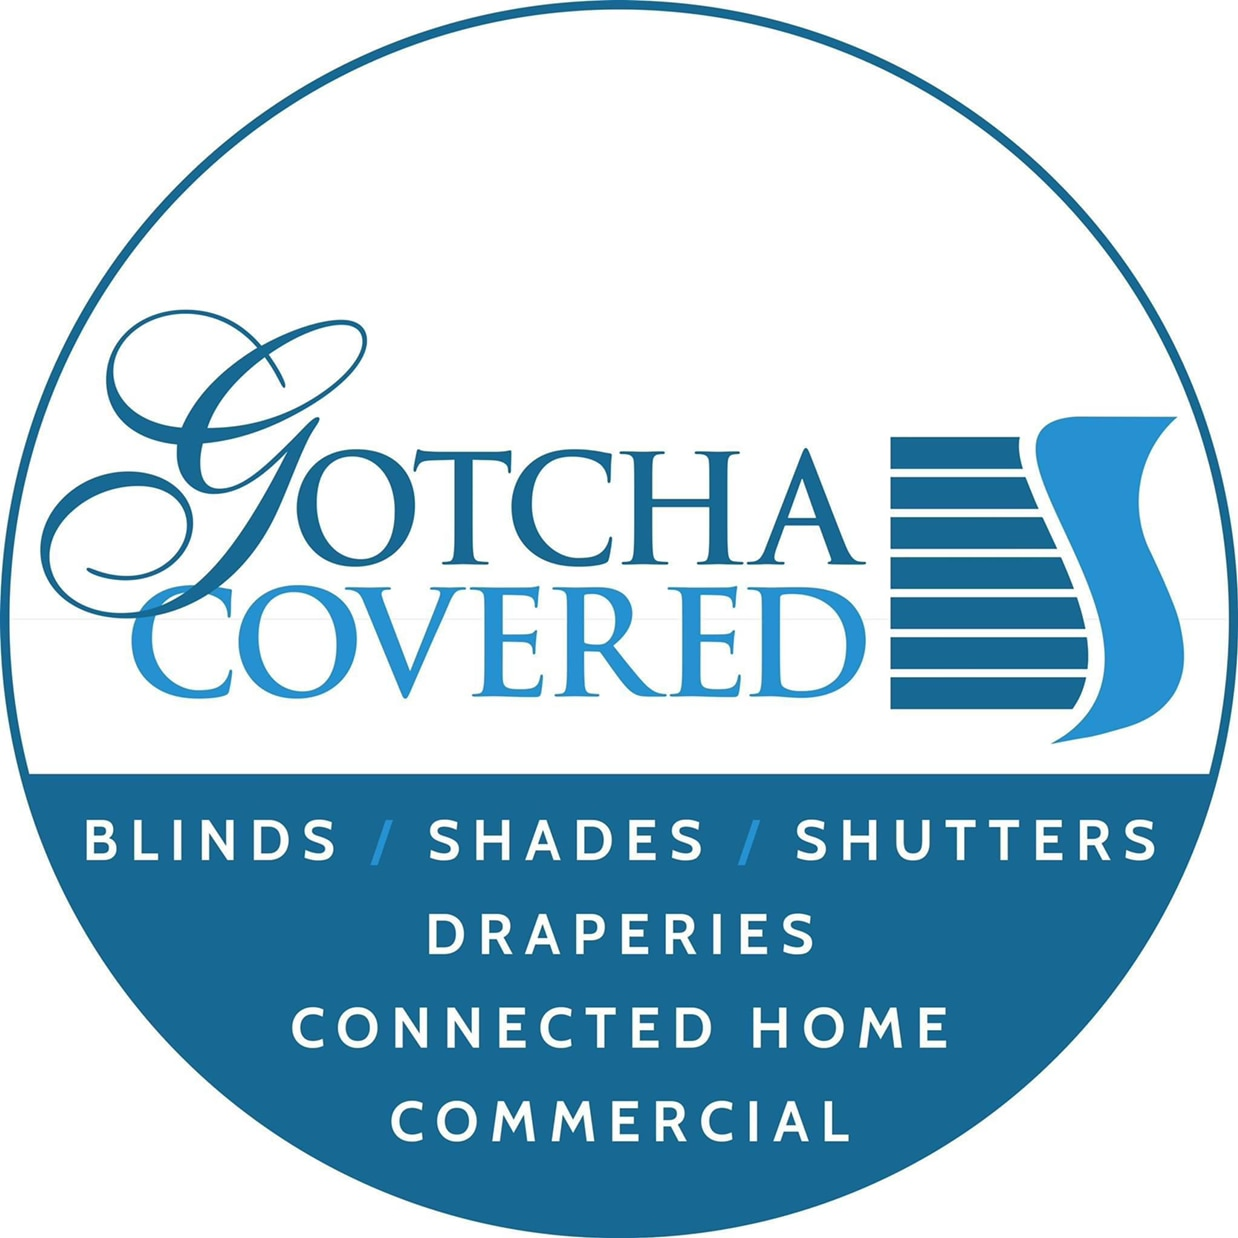 Gotcha Covered of Avon logo